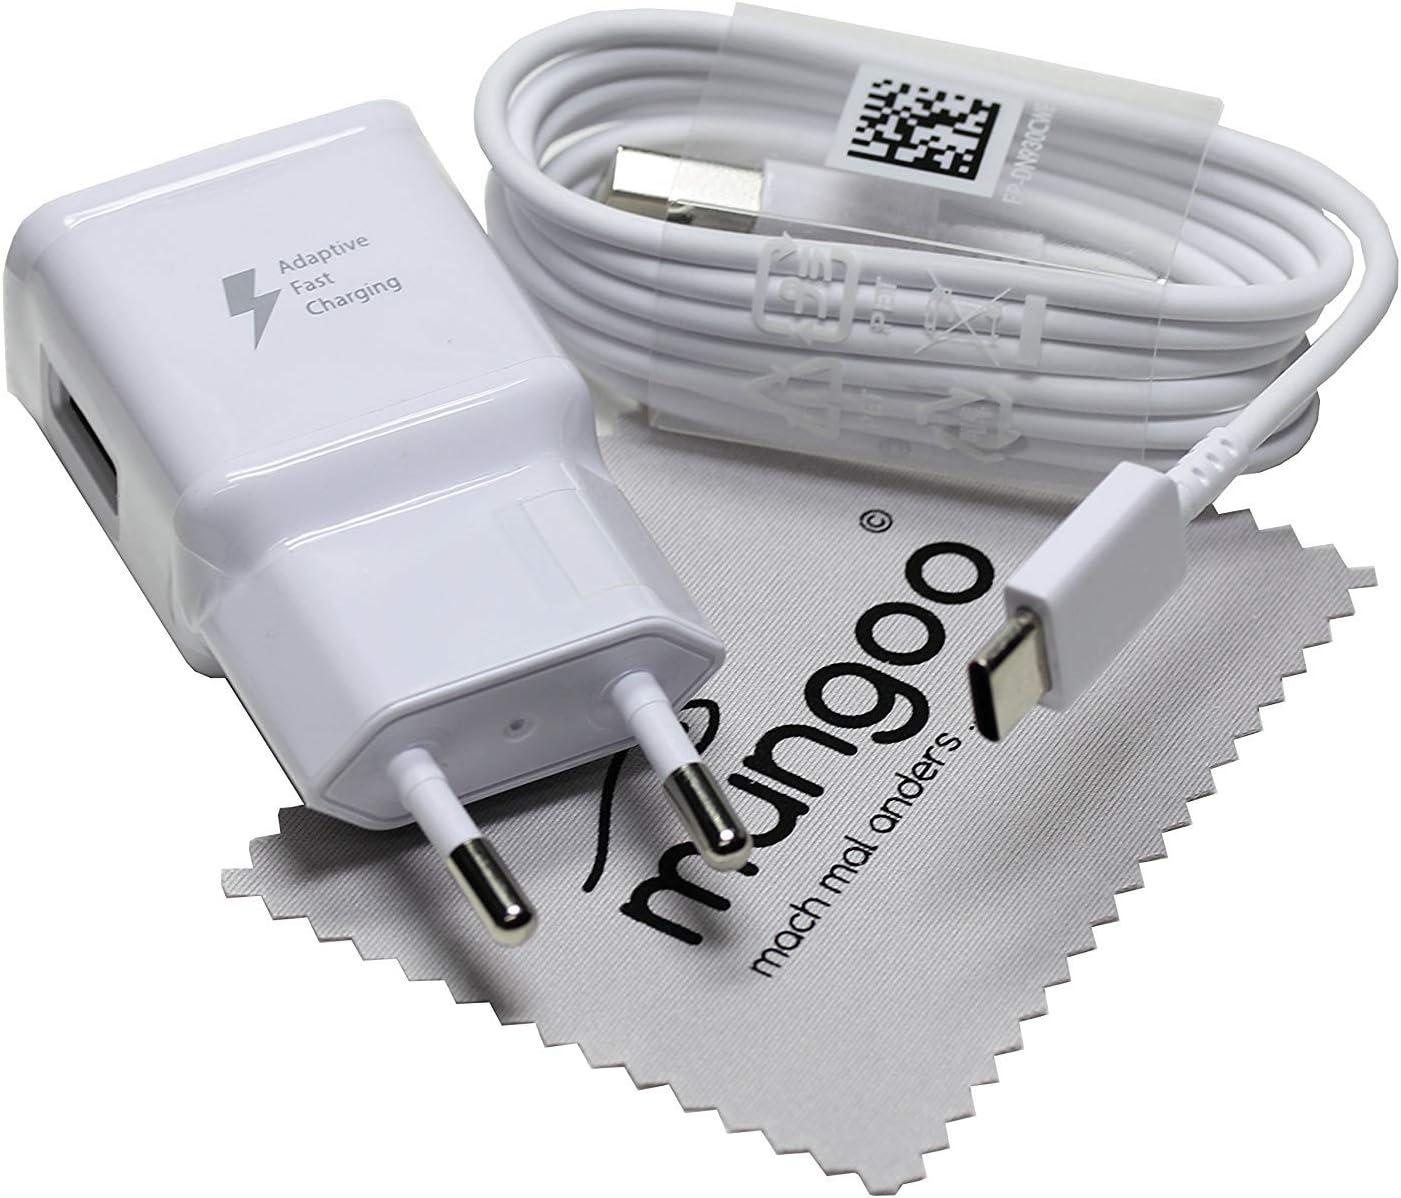 Original Blitz Fast Samsung Charger 2a Usb Type C Data Amazon De Elektronik